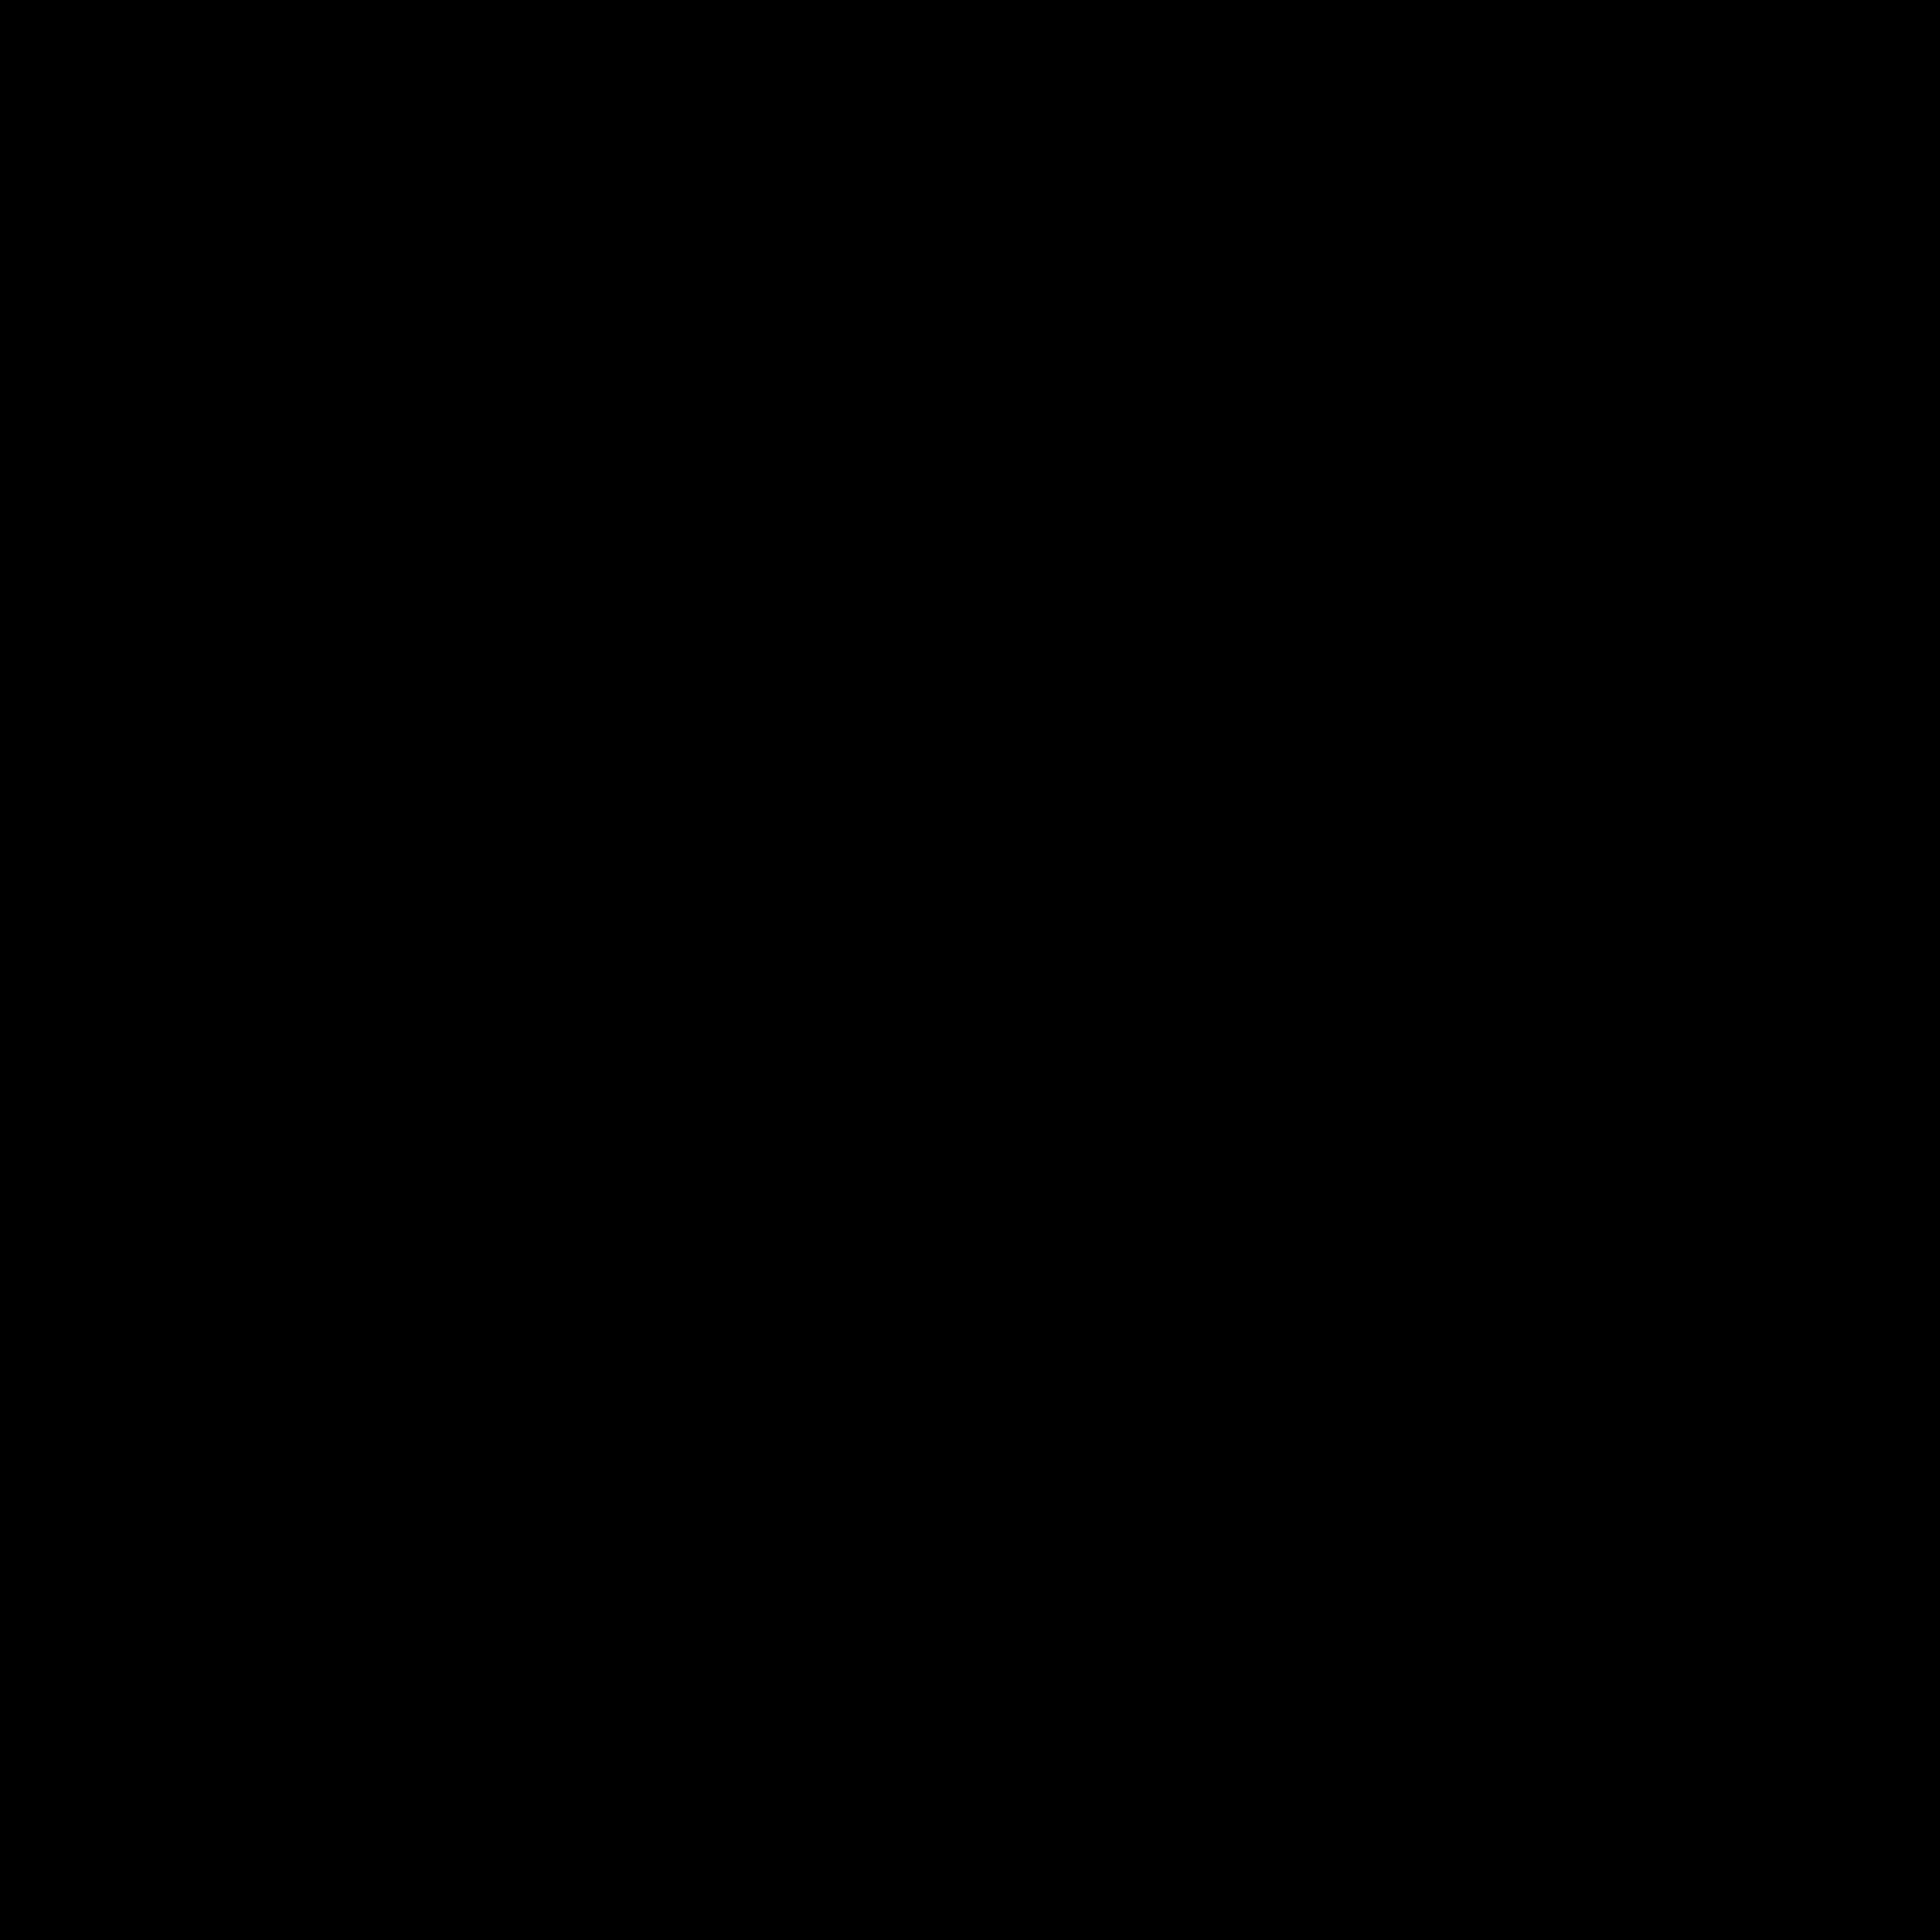 2000px-Tennis_pictogram.svg